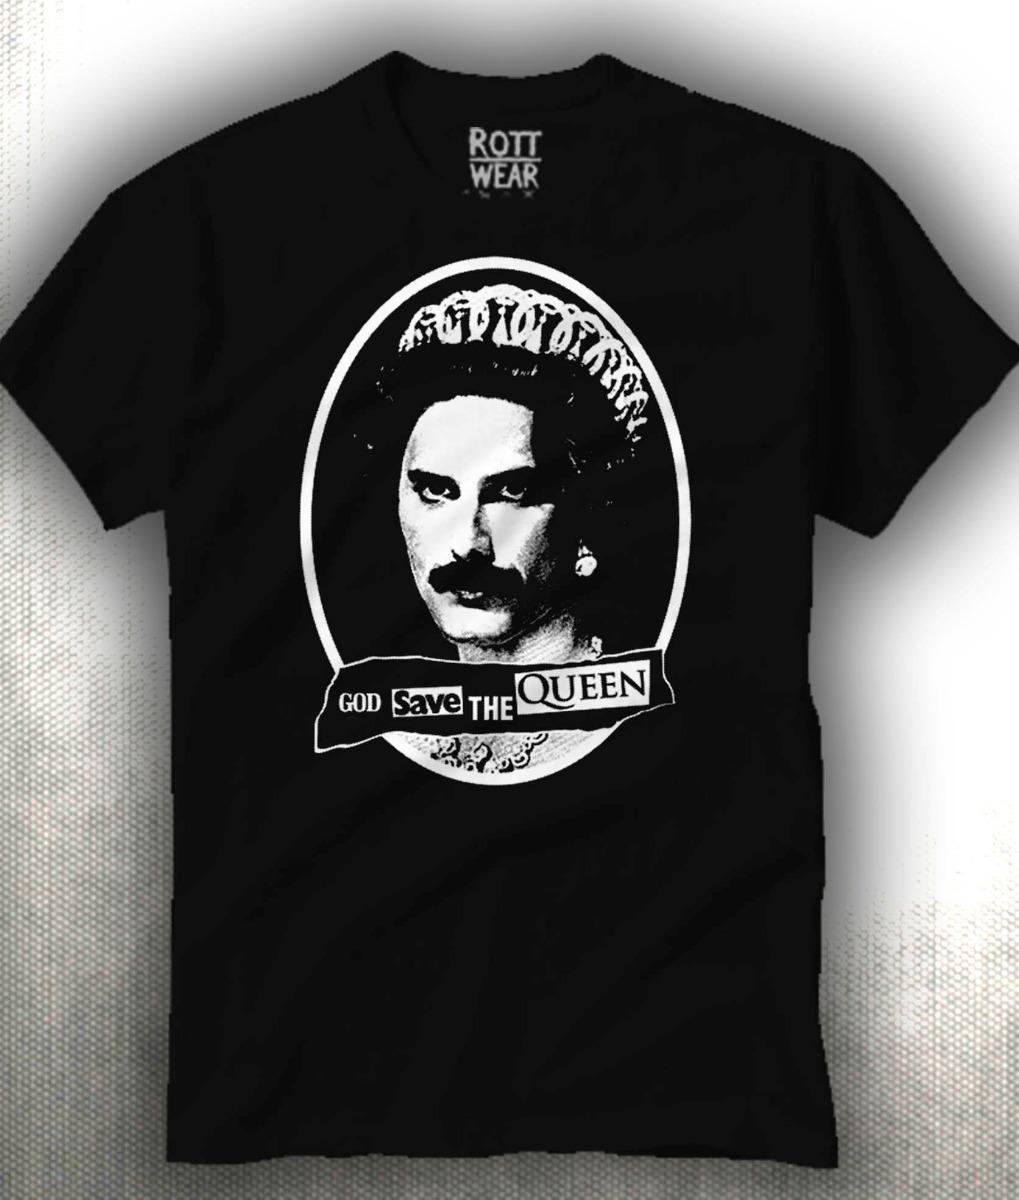 Queen Freddie Mercury God Save The Queen Playera Rott Wear